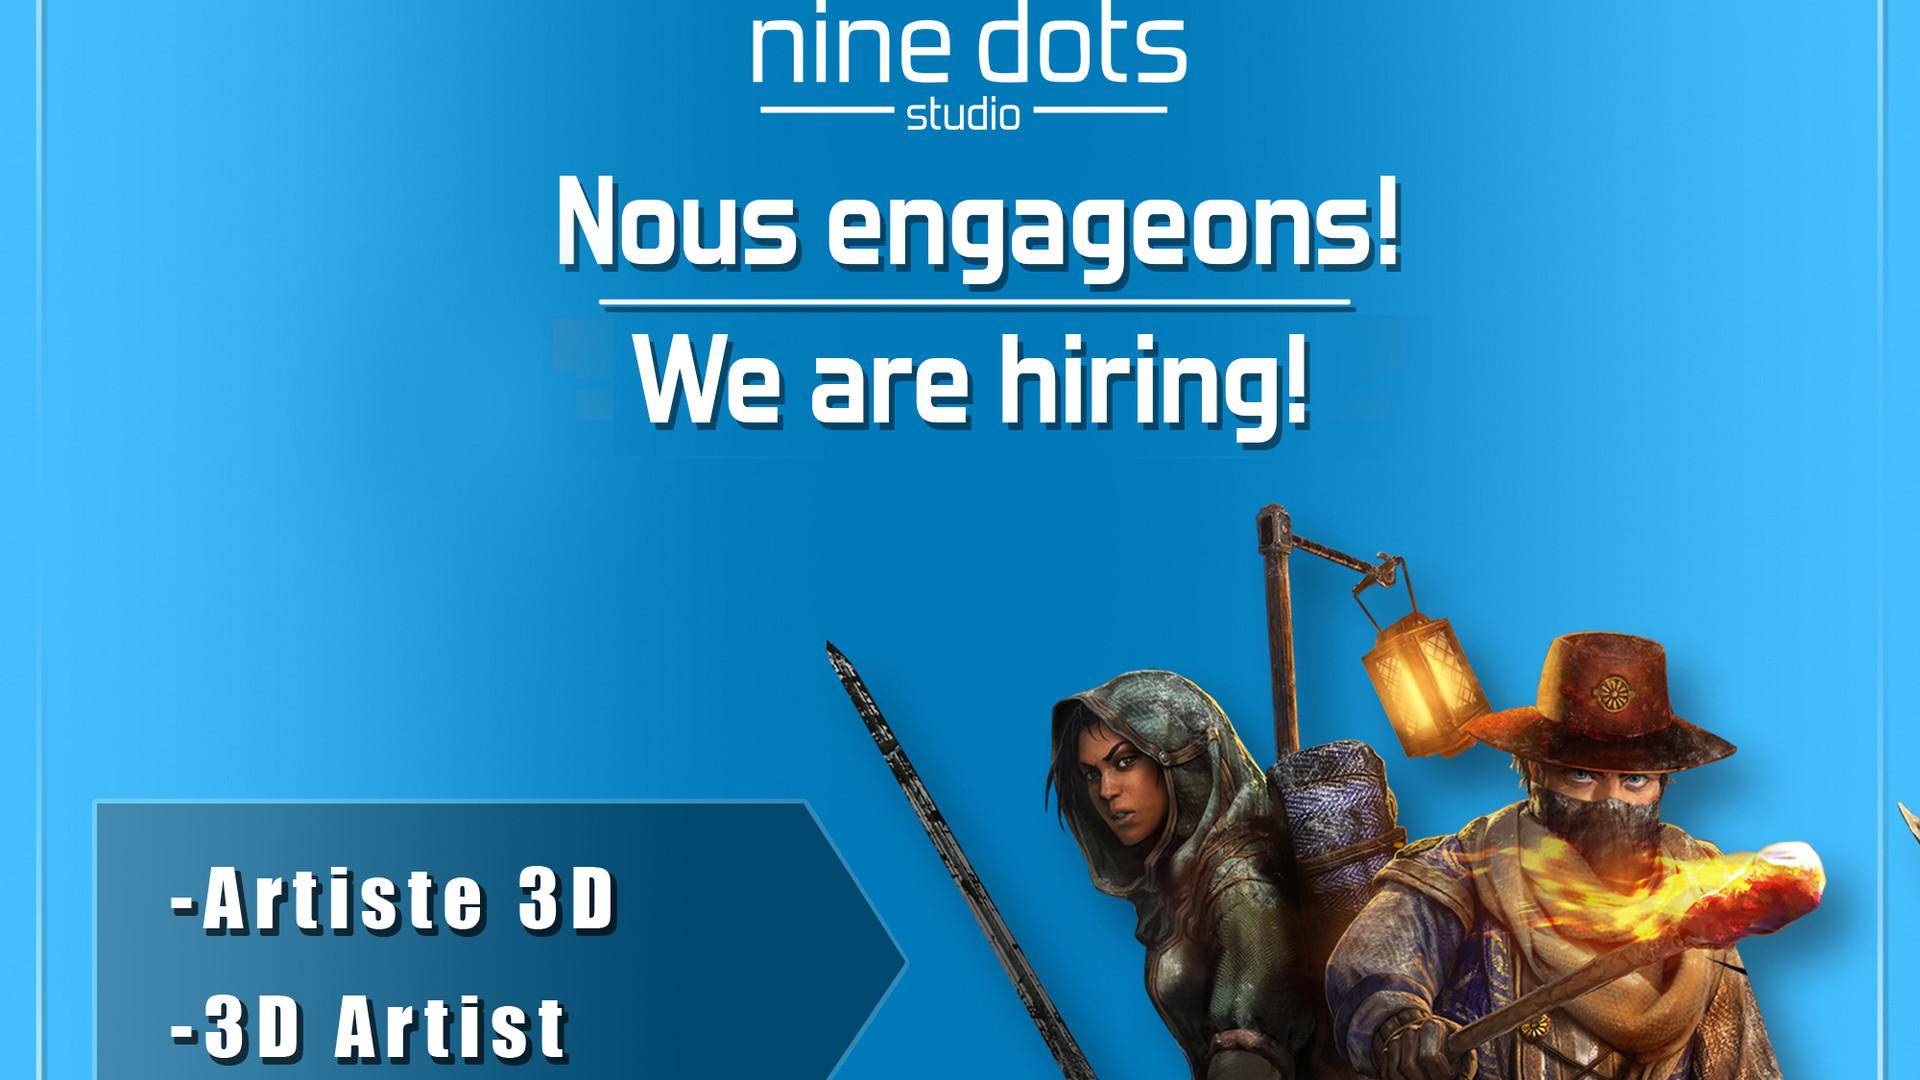 We're hiring! Nous engageons!